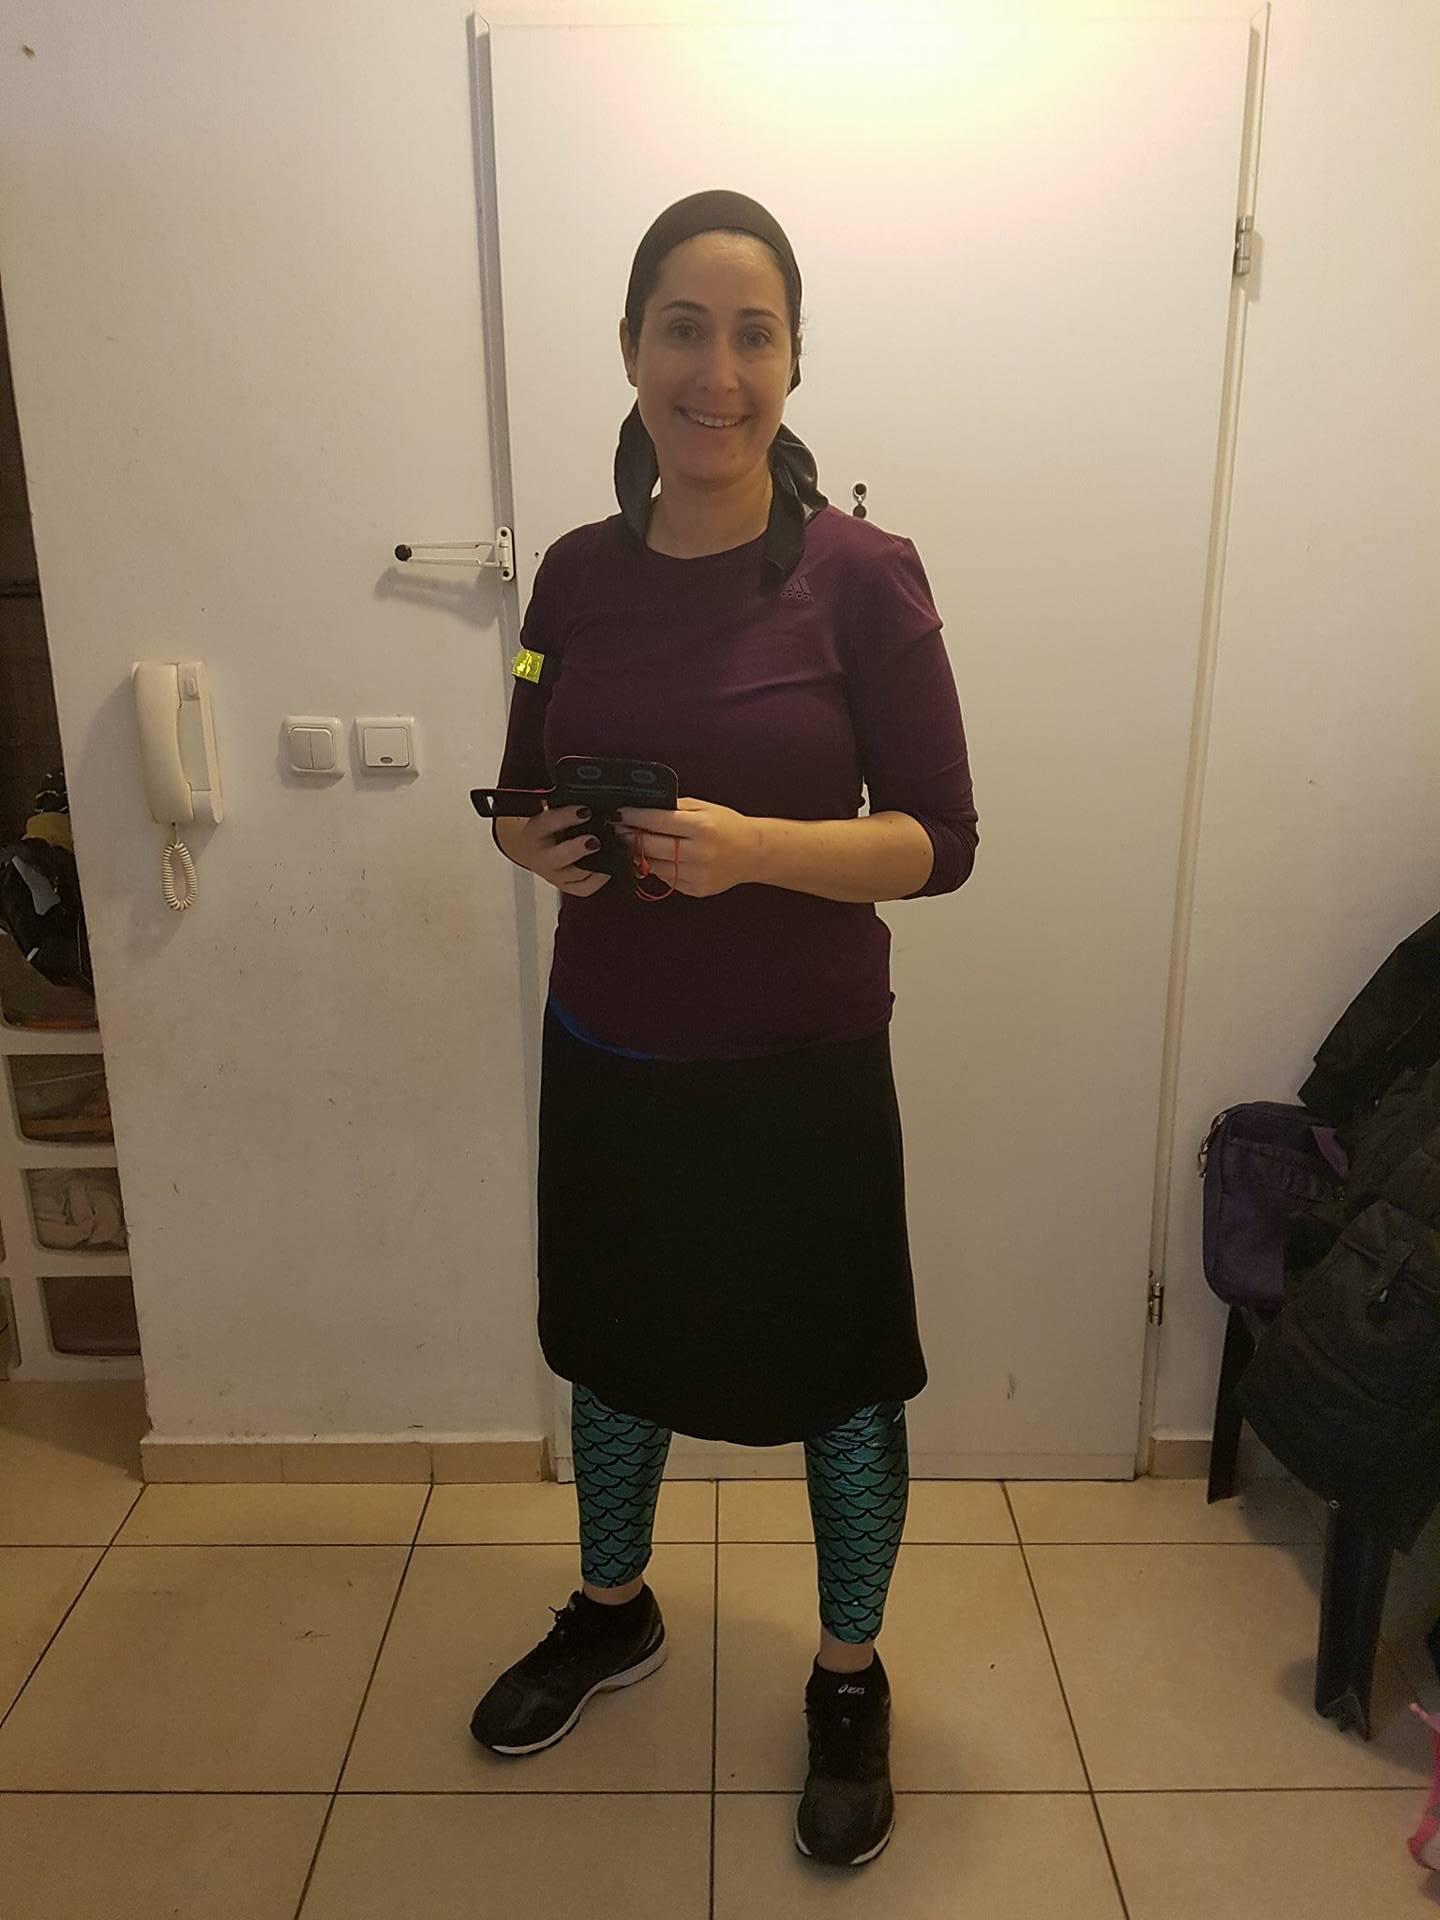 Serie Frauenlauf | Michal had geen excuses meer en ging lopen!